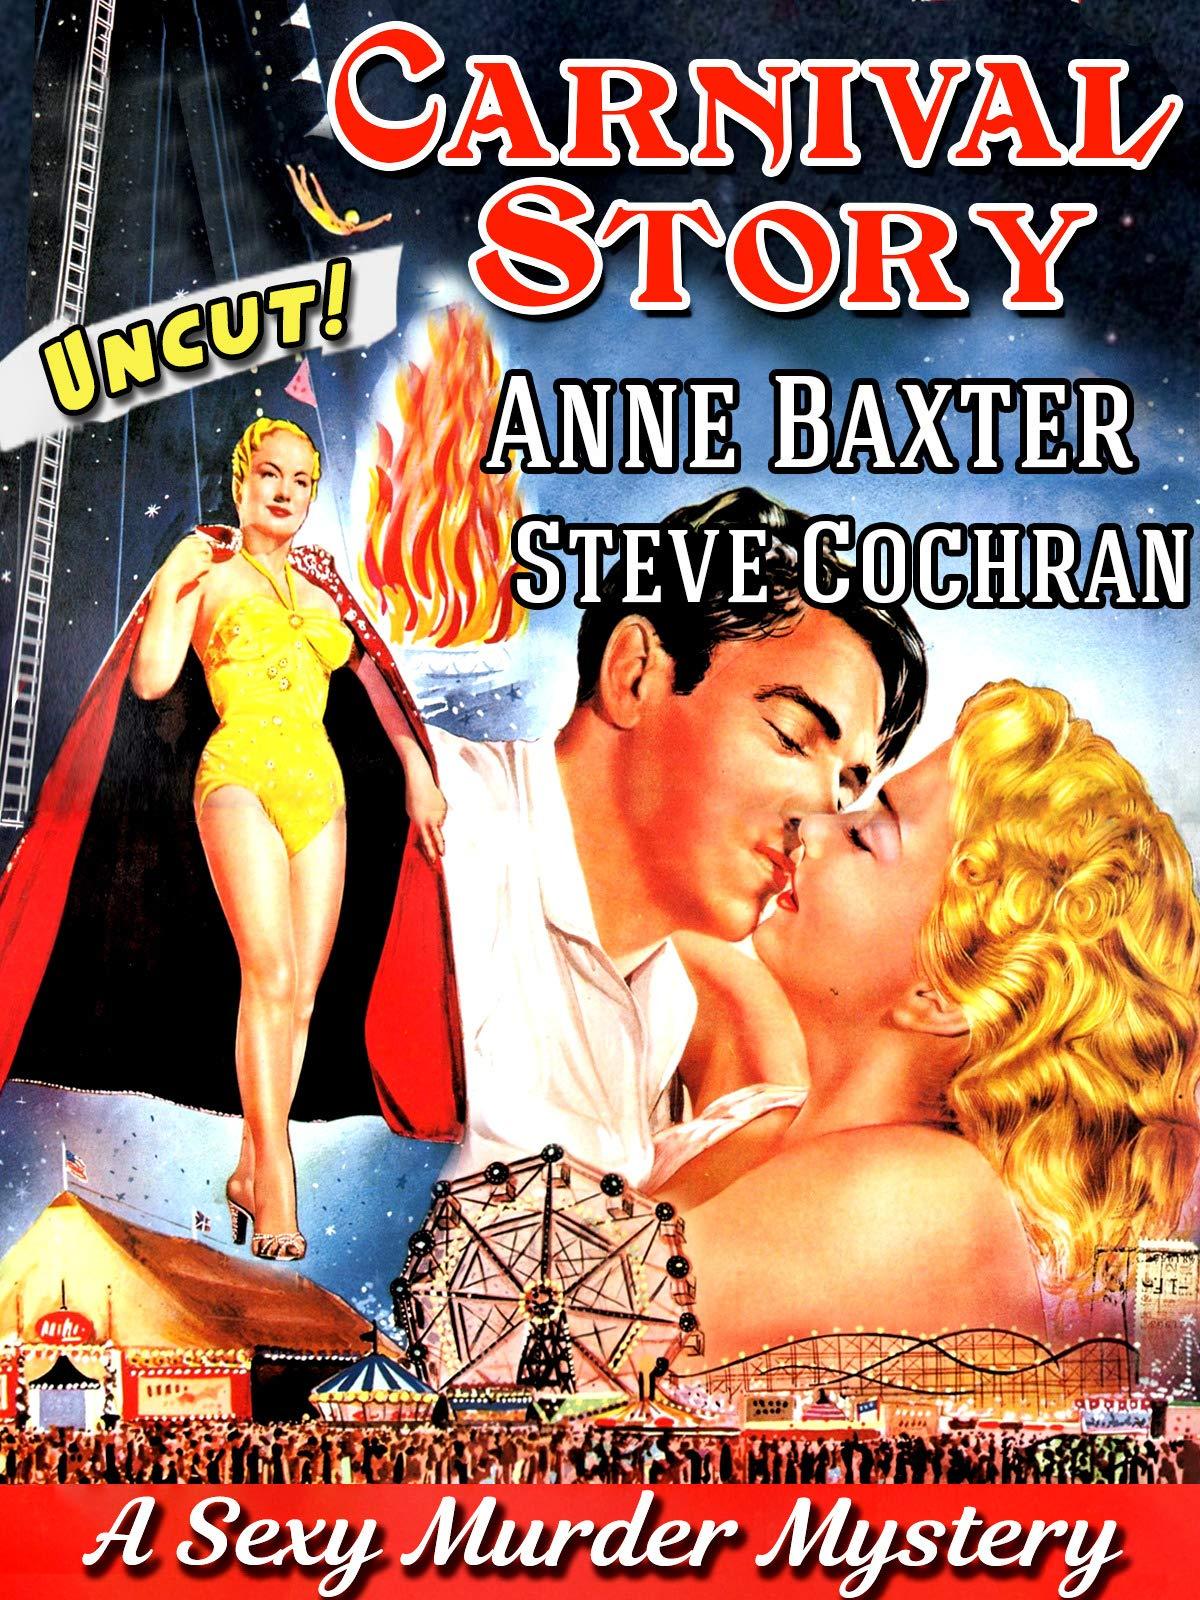 Carnival Story - Anne Baxter, Steve Cochran, A Sexy Murder Mystery, Uncut!